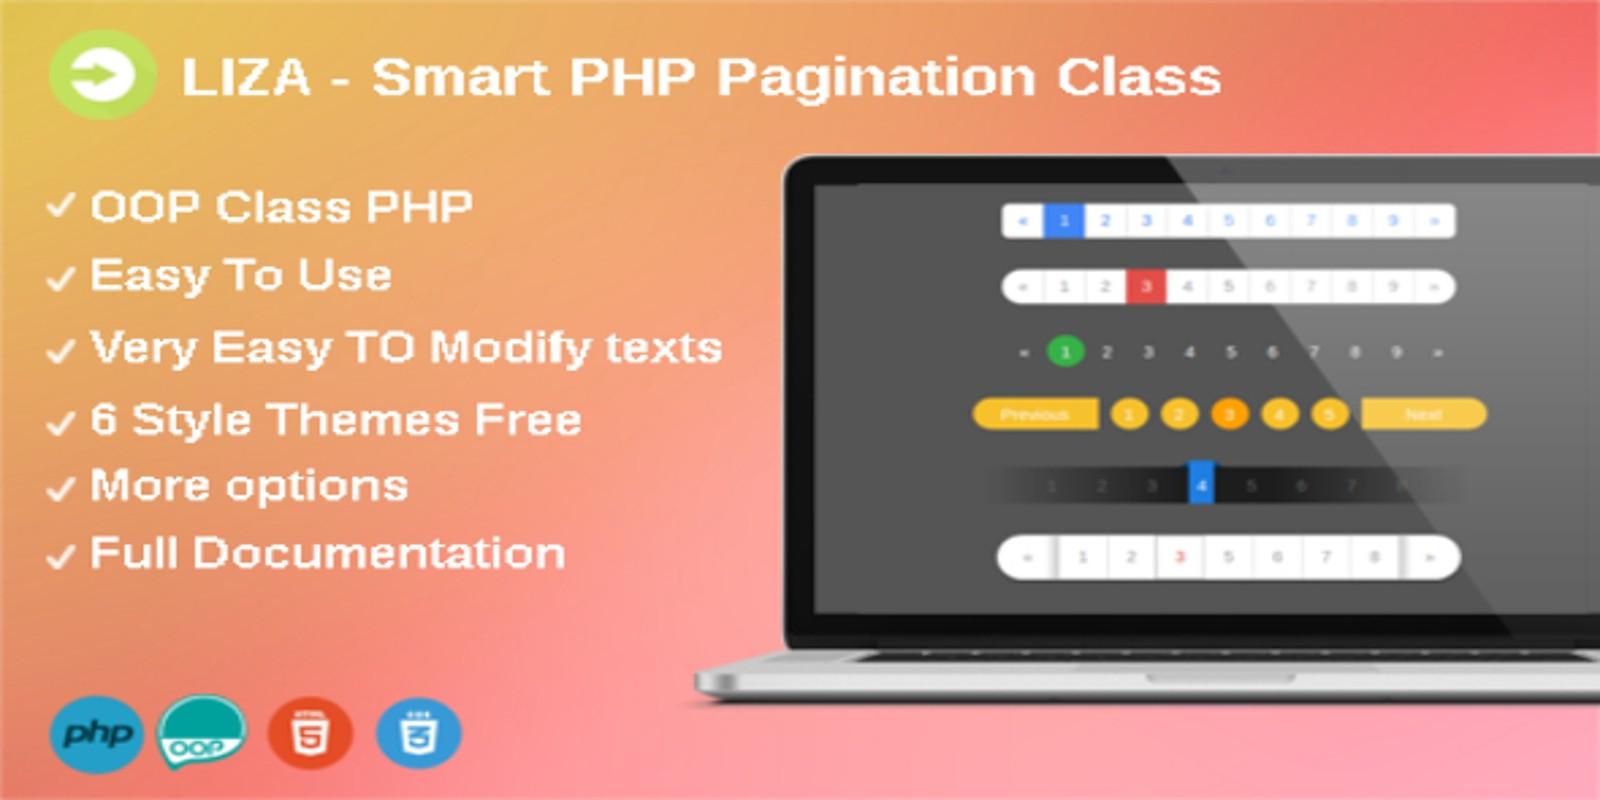 Liza - Smart PHP Pagination Class